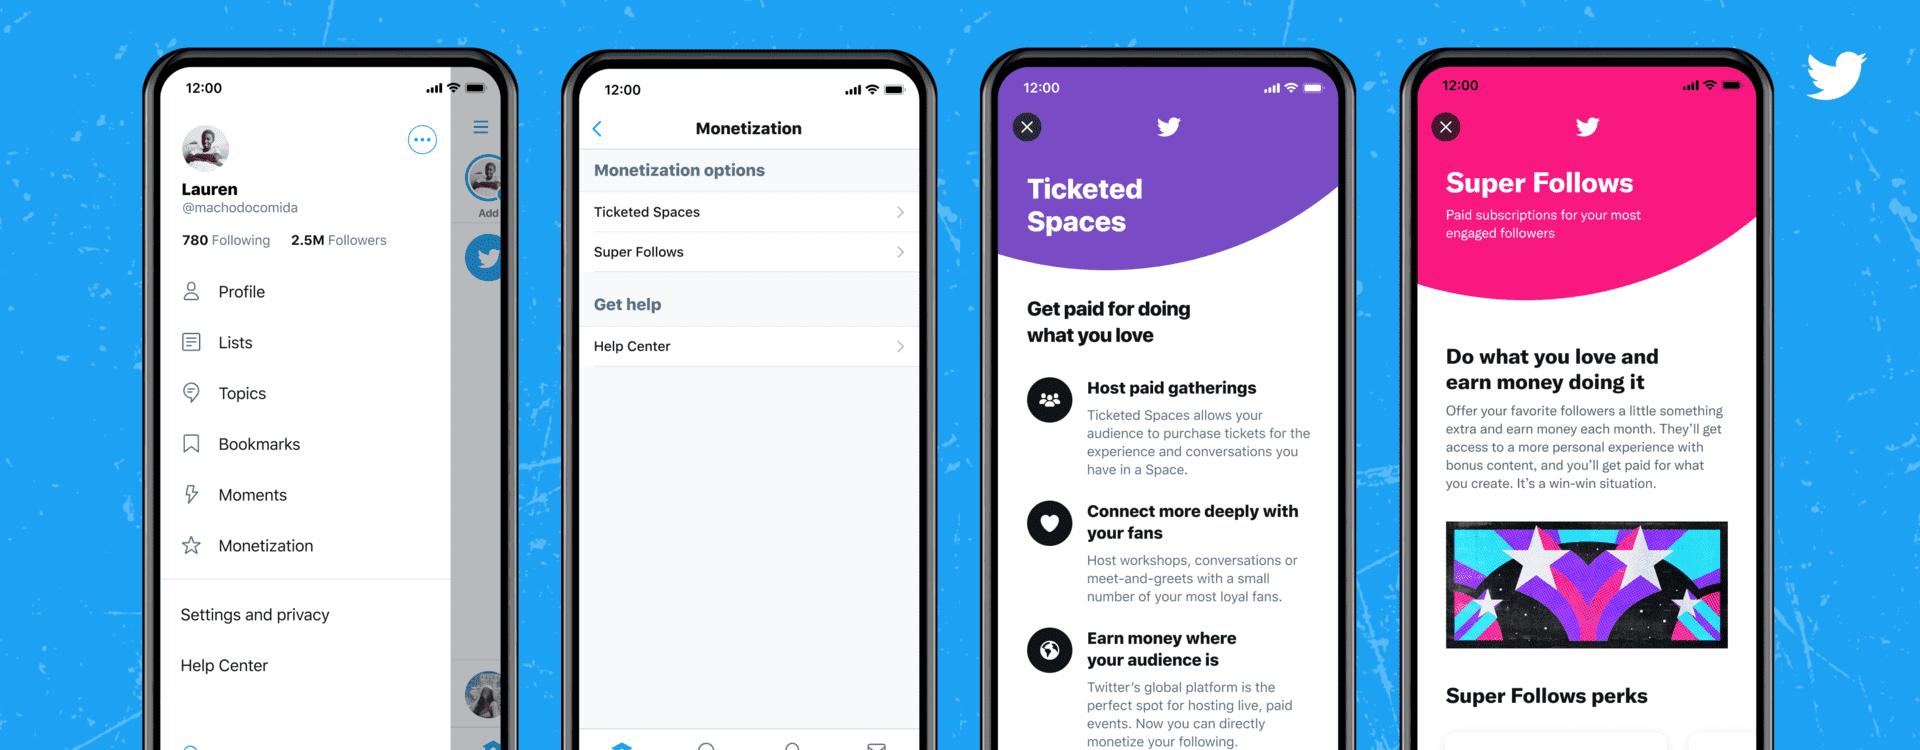 Twitter 新サービスチケット制「Spaces」と「Super Follows」開始